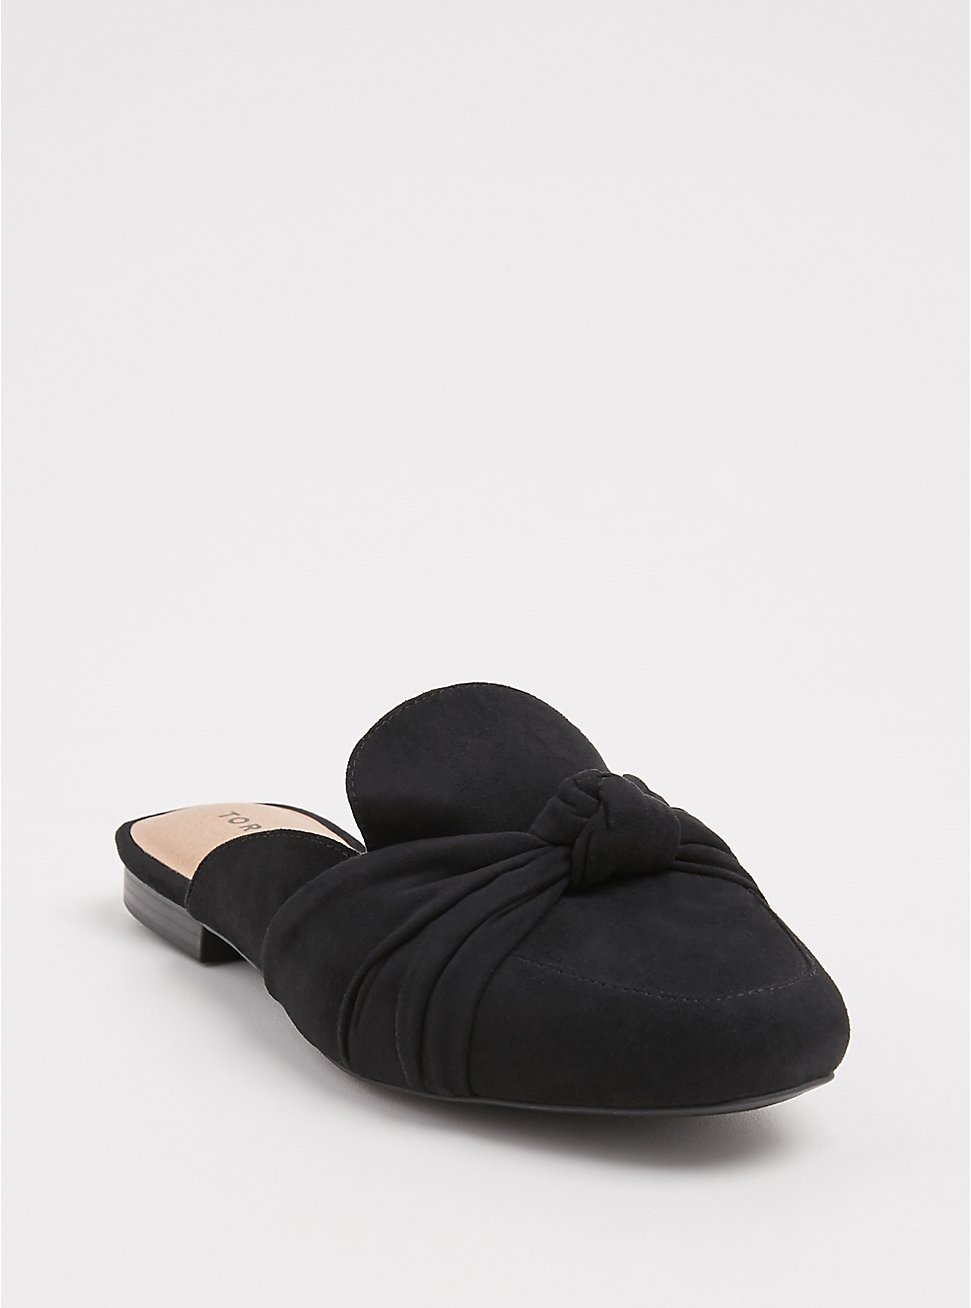 Black Faux Suede Bow Loafer Mule (WW), BLACK, hi-res